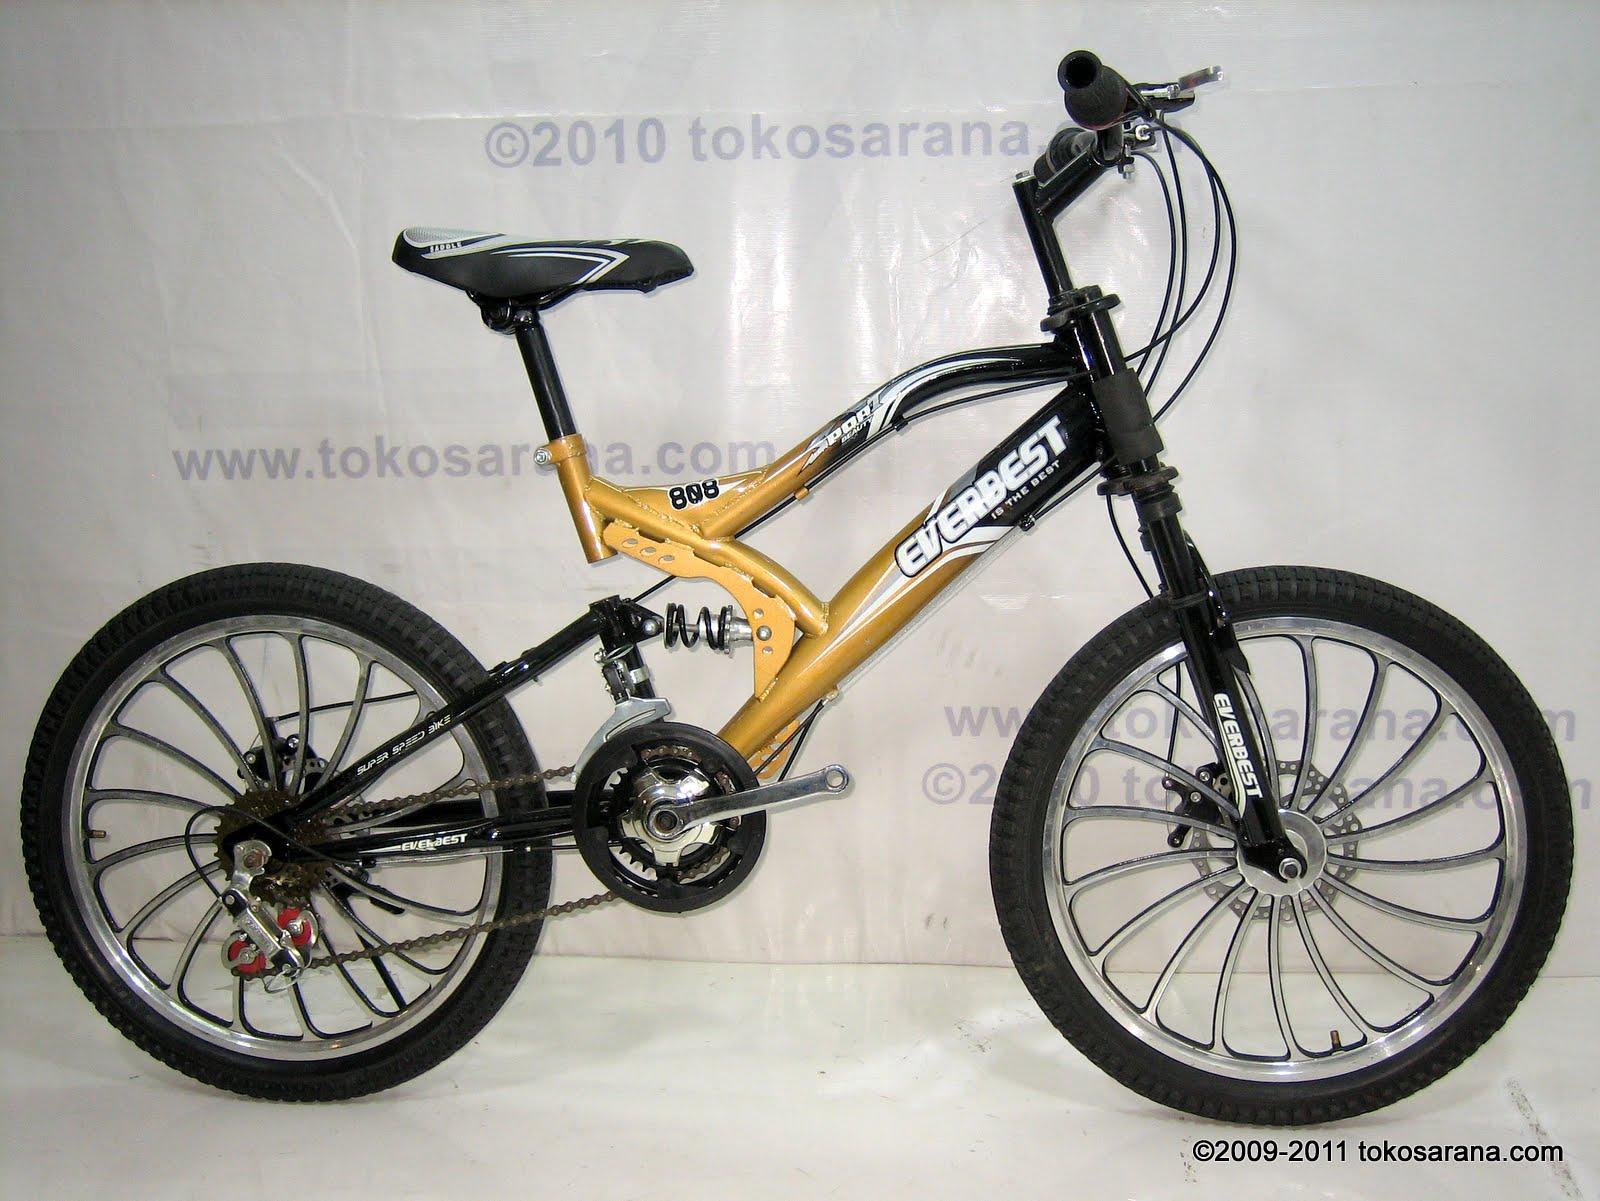 Sepeda Gunung Everbest 20-808 RC Racing 20 Inci ~ News ...